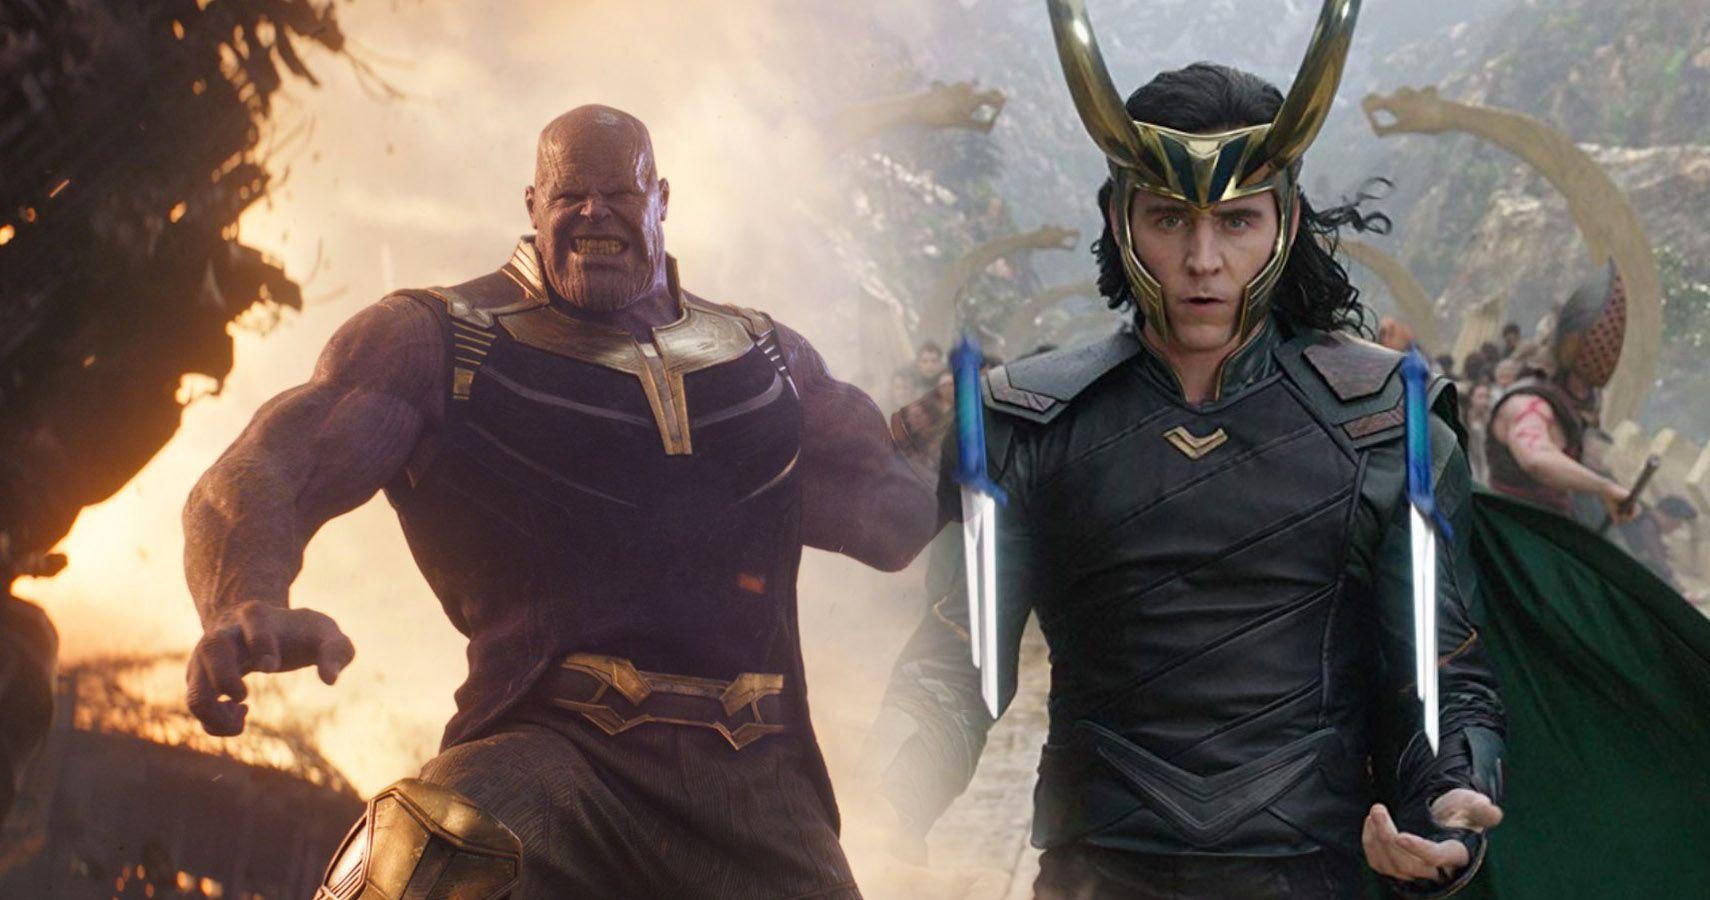 Thanos Deserves a Disney+ Series More Than Loki | CBR